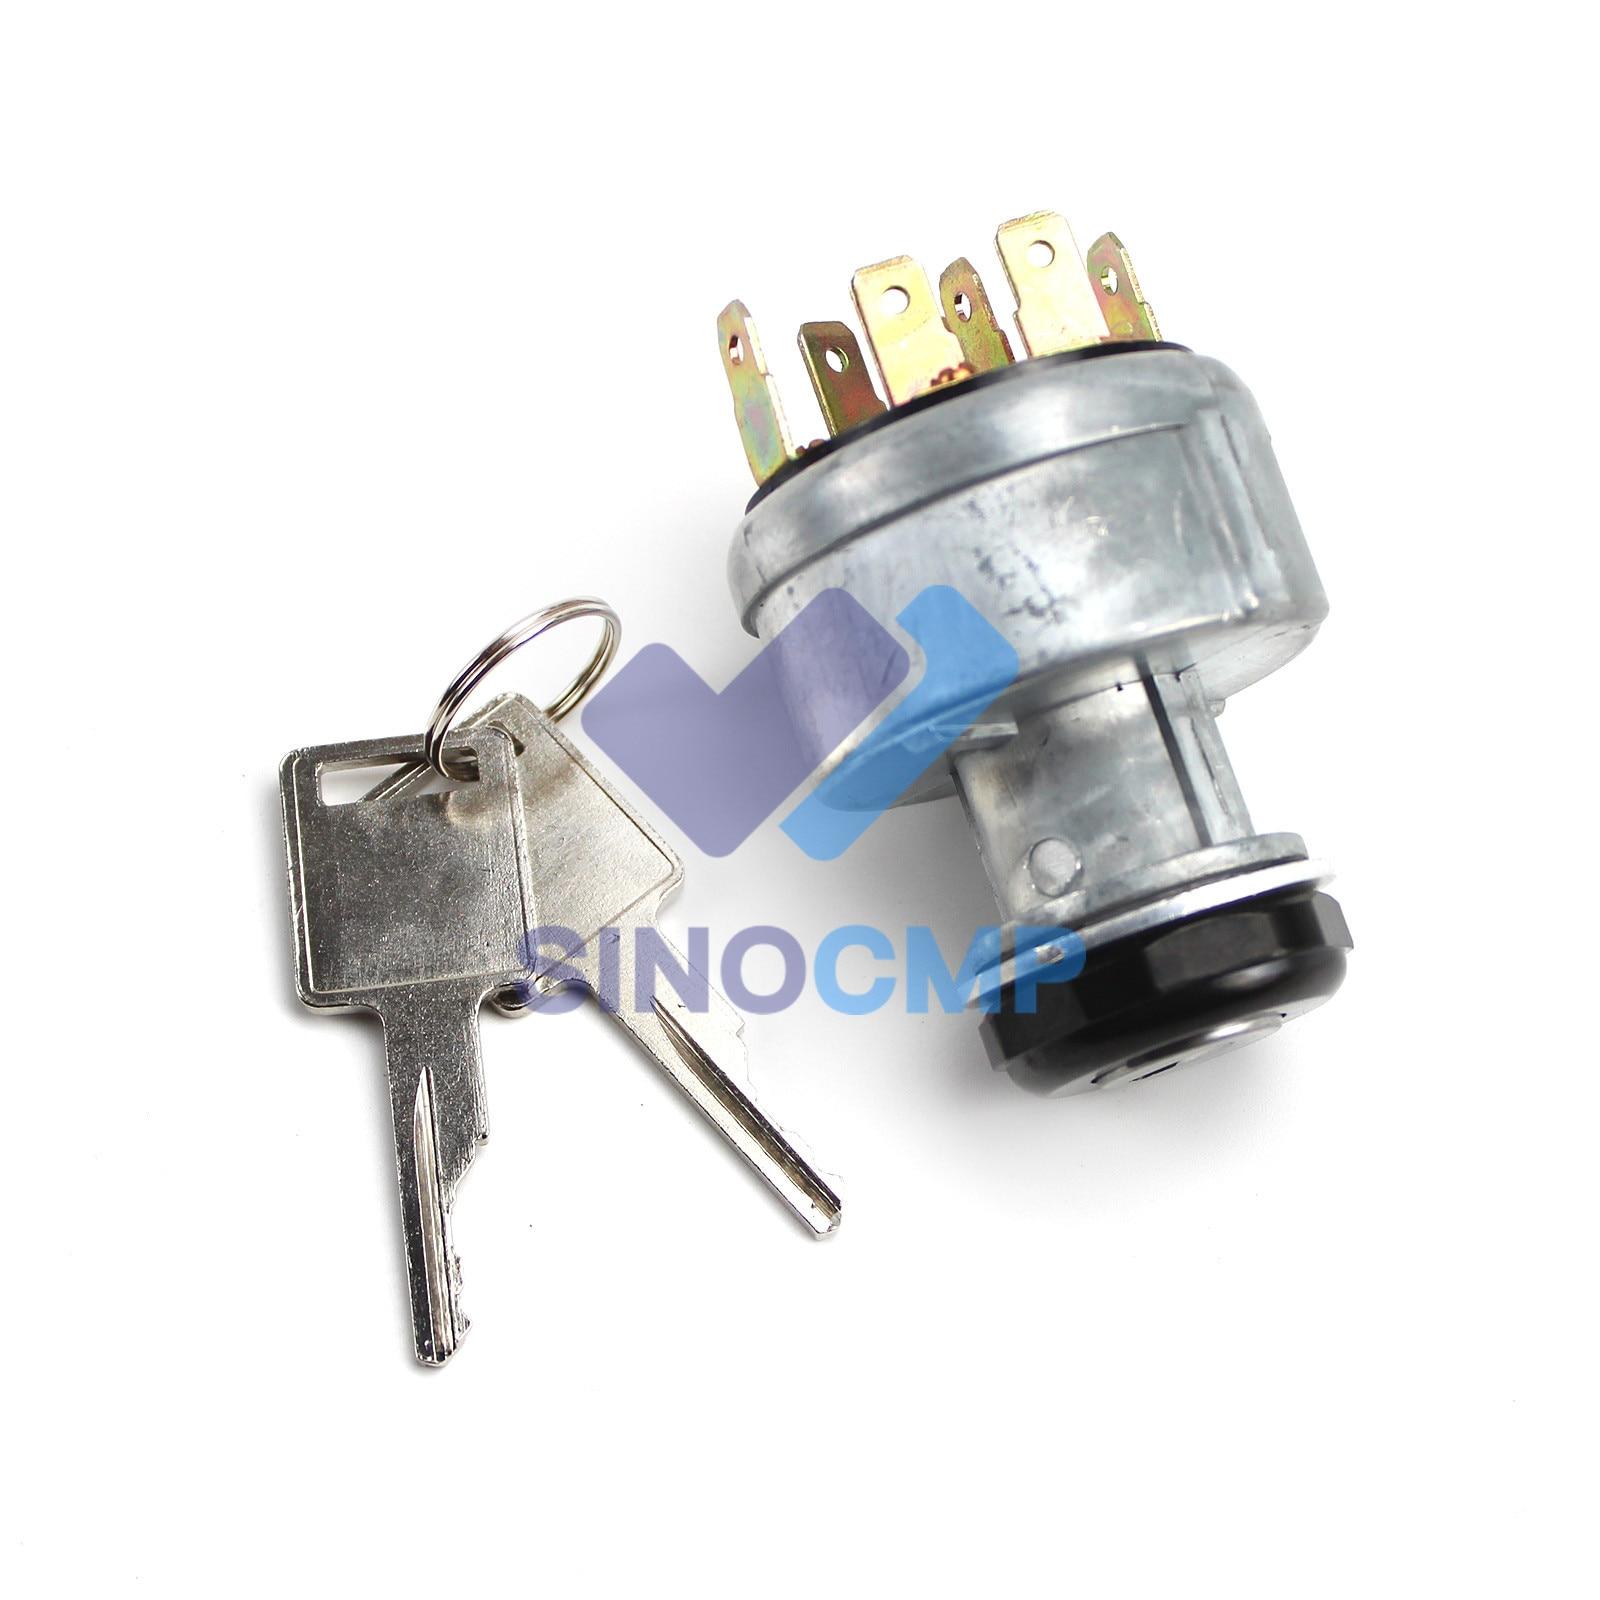 282775A 1 مفتاح إشعال ل انزلاقية التوجيه 760 921 1150G 1845C 5230 85XT MX100